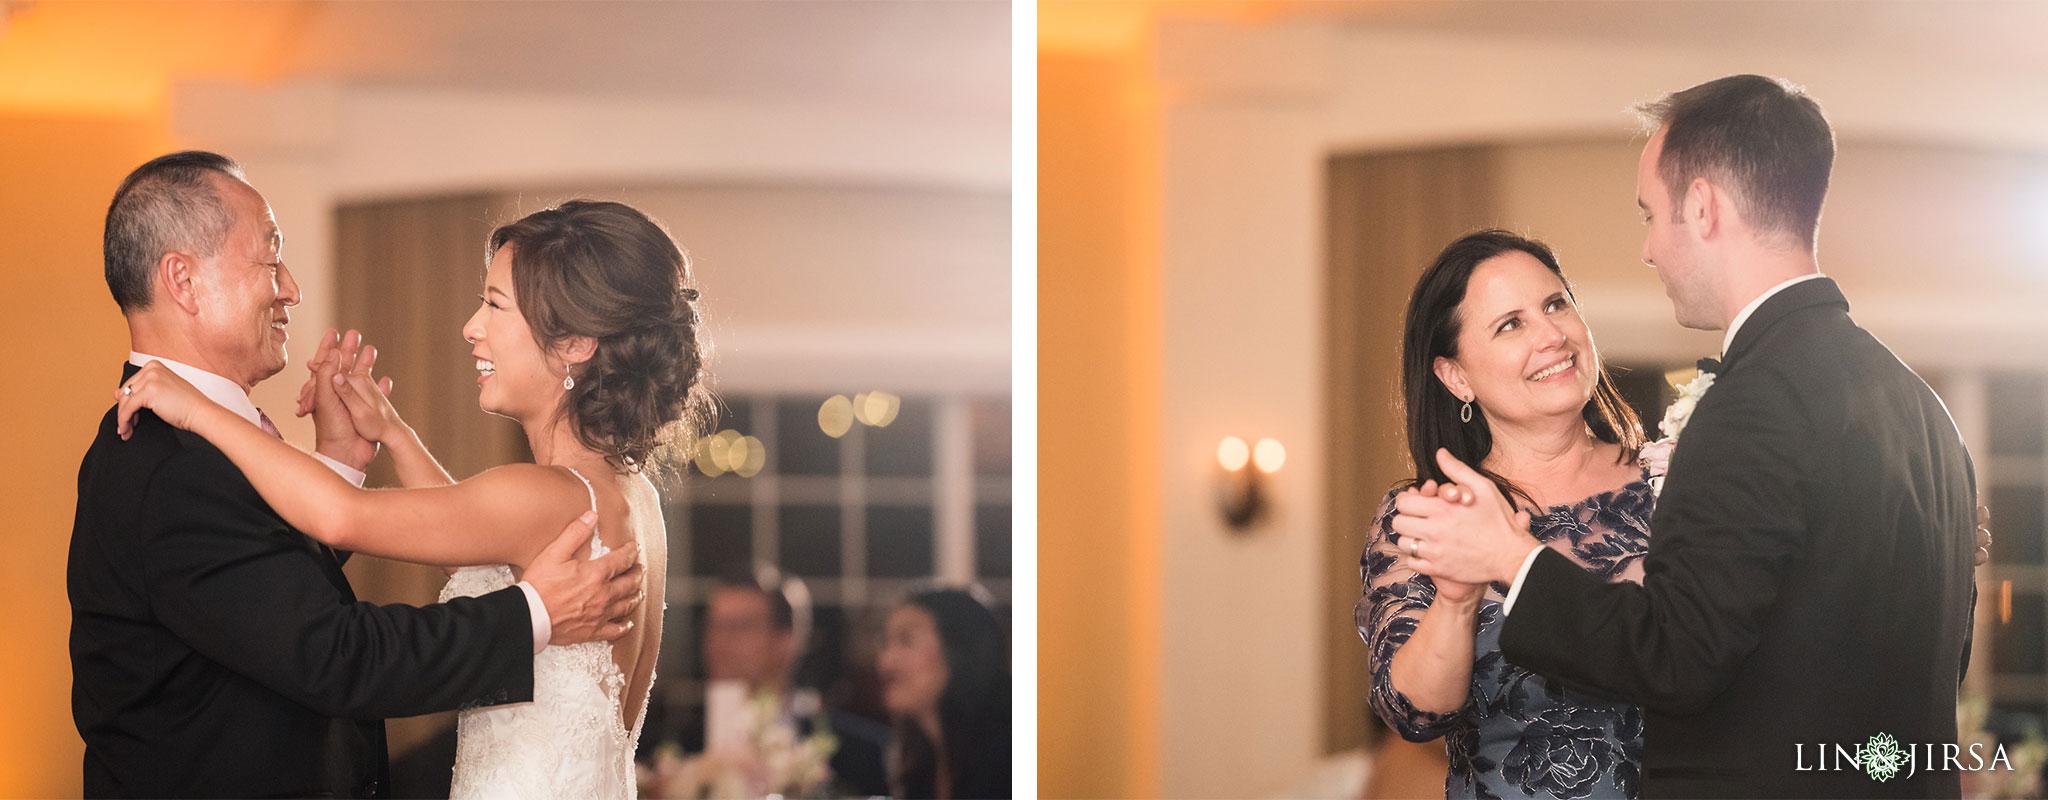 32 Ponte Winery Vineyard Garden Temecula Wedding Reception Photography